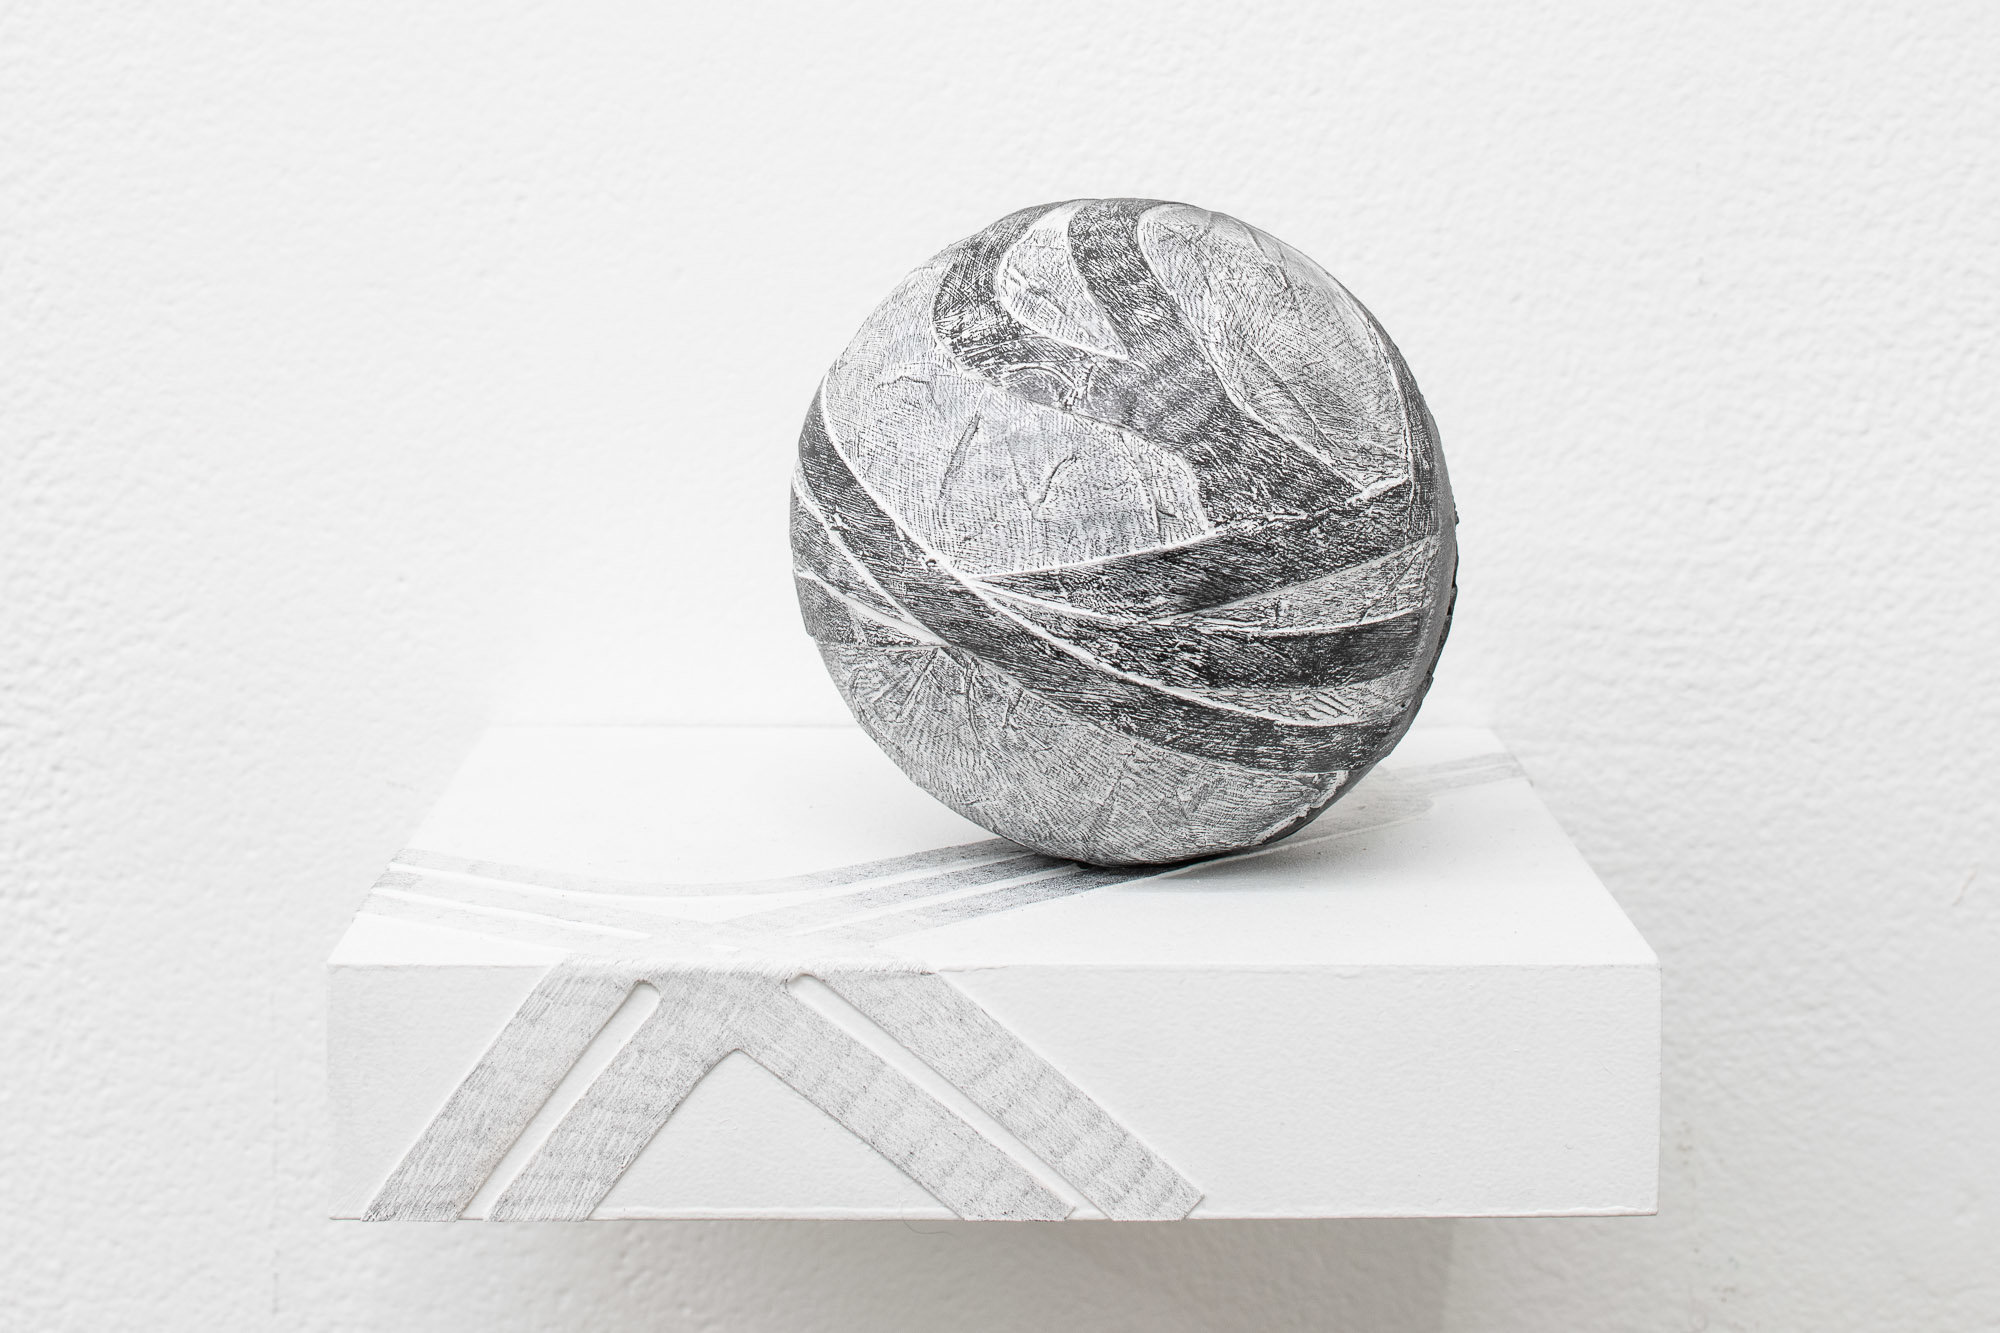 Residual #12 Pocket Globe